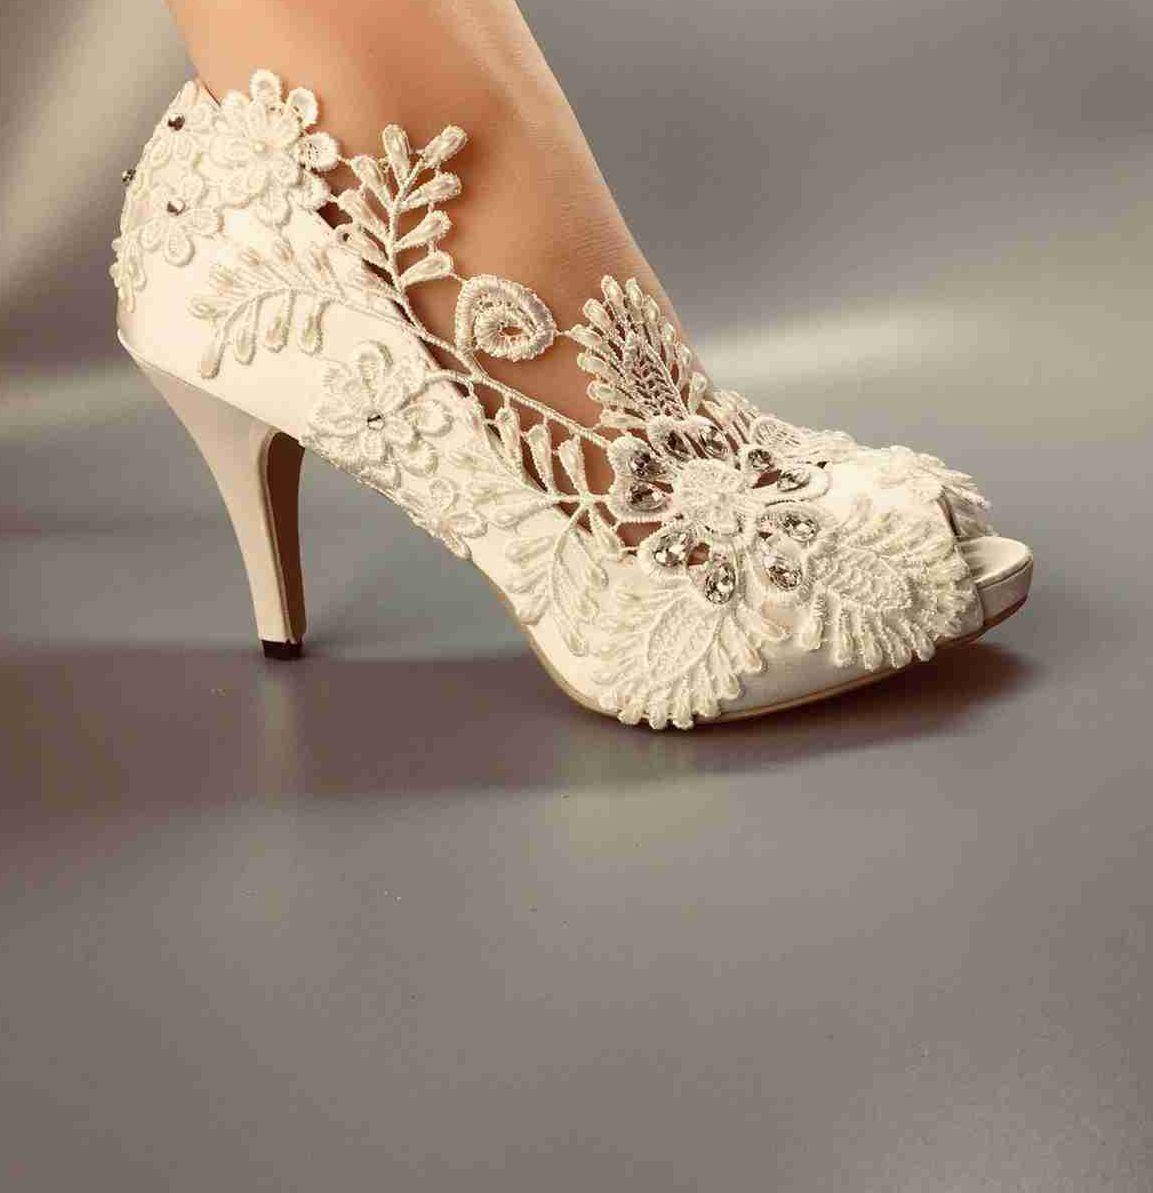 Women Wedding Peep Toe Shoes Waterproof White Lace Bride Wedding Dresses  HEEL Diamond Lace Manual Wedding BRIDAL HEEL Shoes SIZE EU 35 42 Taupe  Wedding ... 4e8c02247958